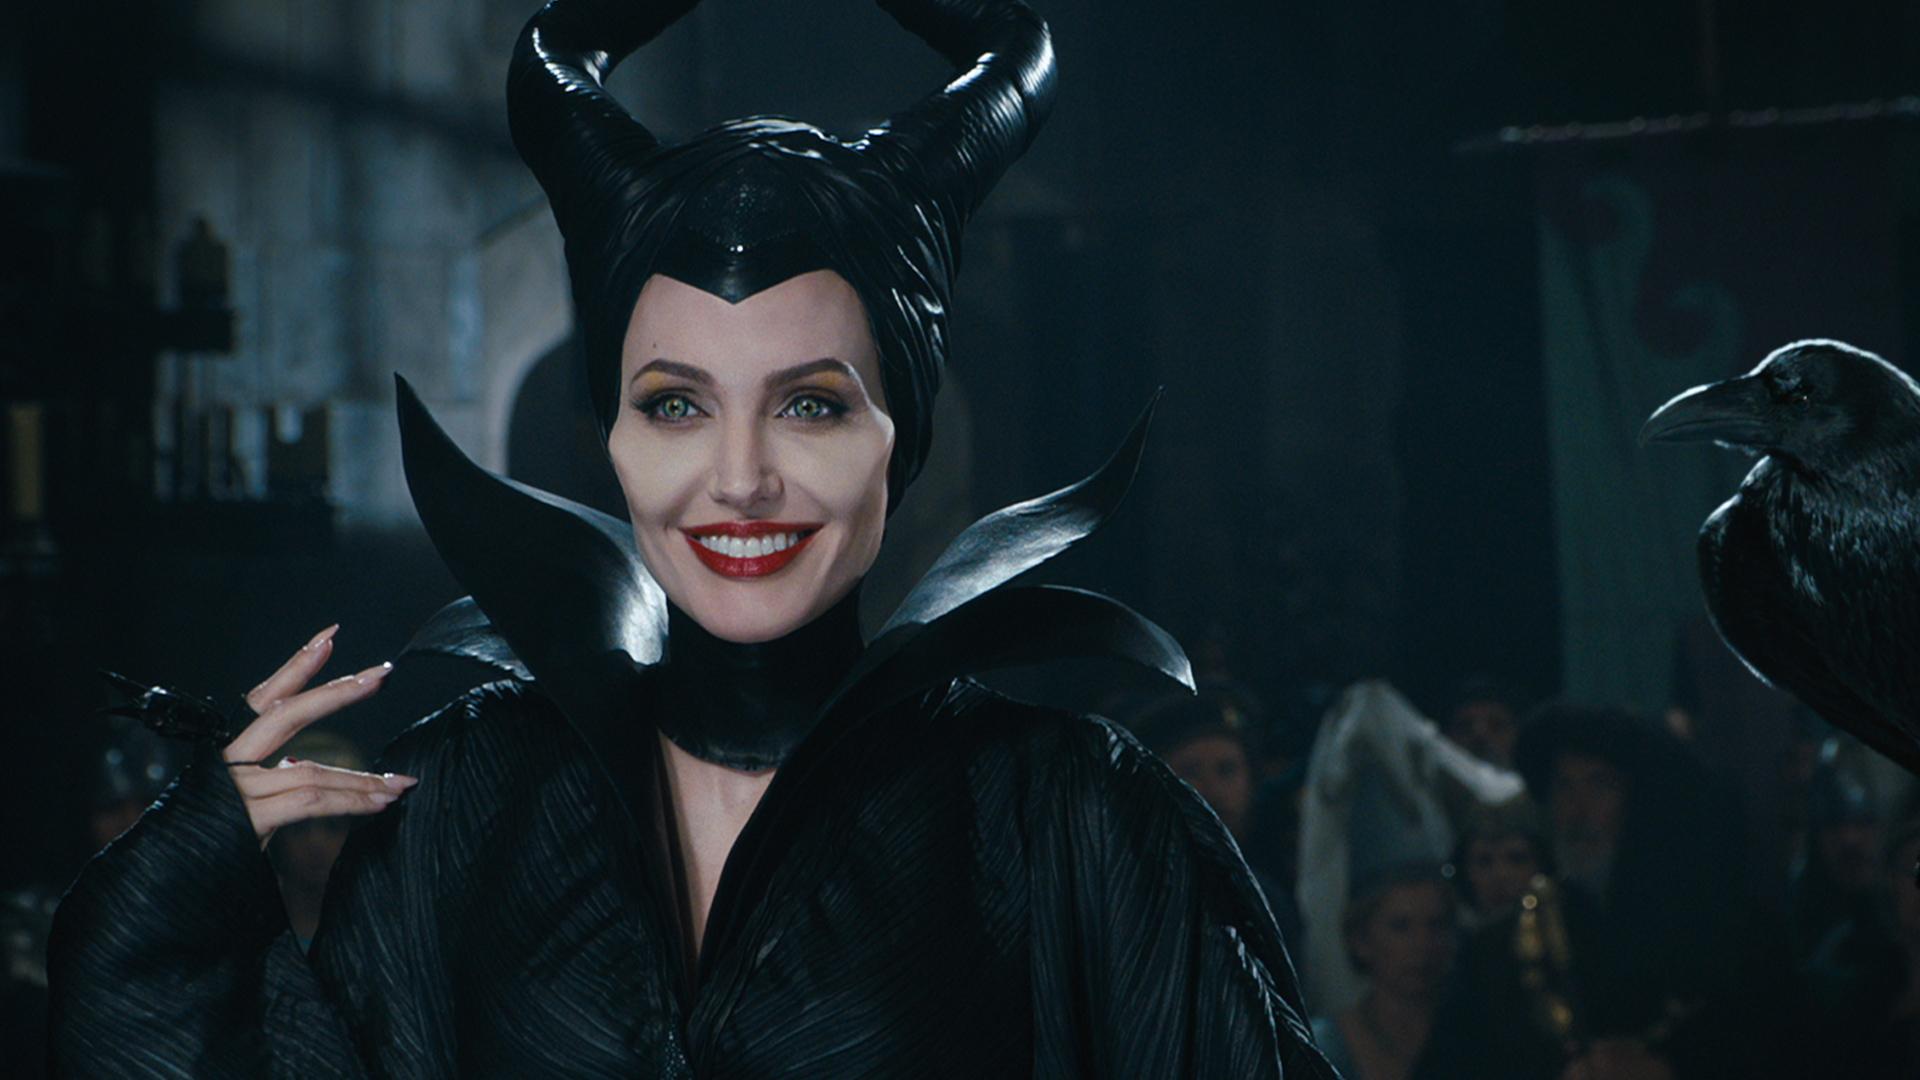 http://images6.fanpop.com/image/photos/37100000/Angelina-Jolie-Maleficent-maleficent-2014-37151013-1920-1080.jpg